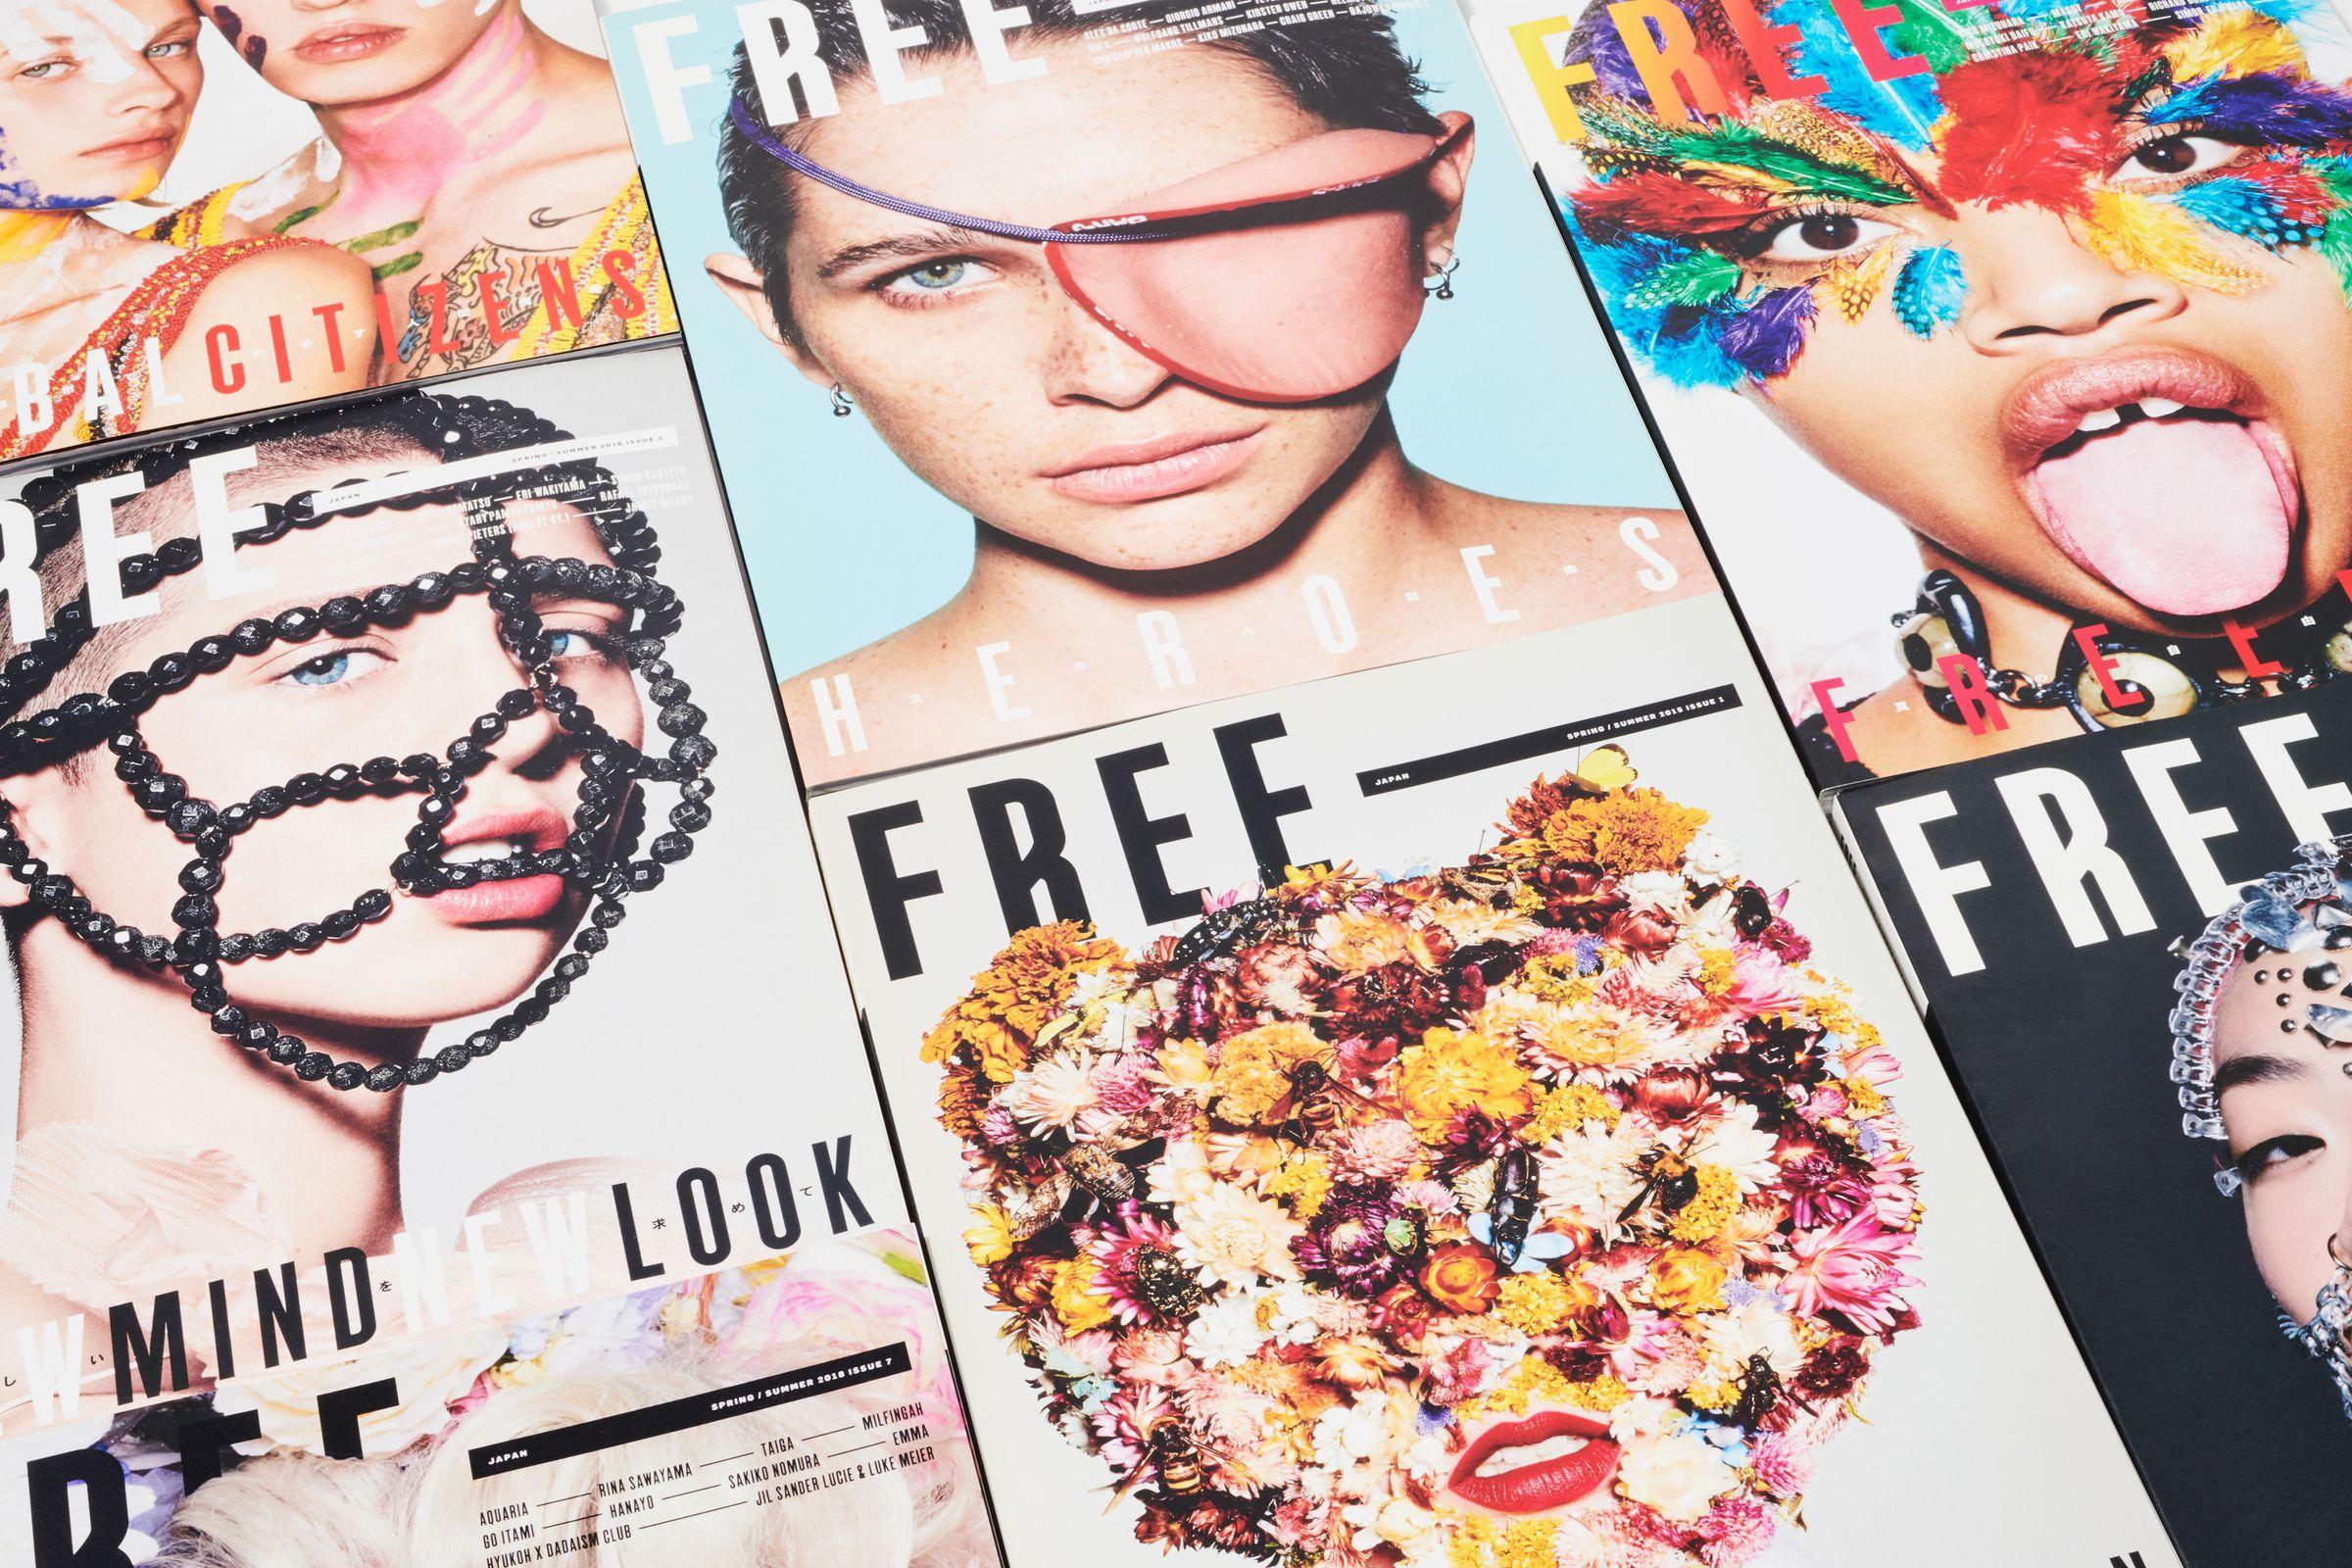 FREE Magazine covers